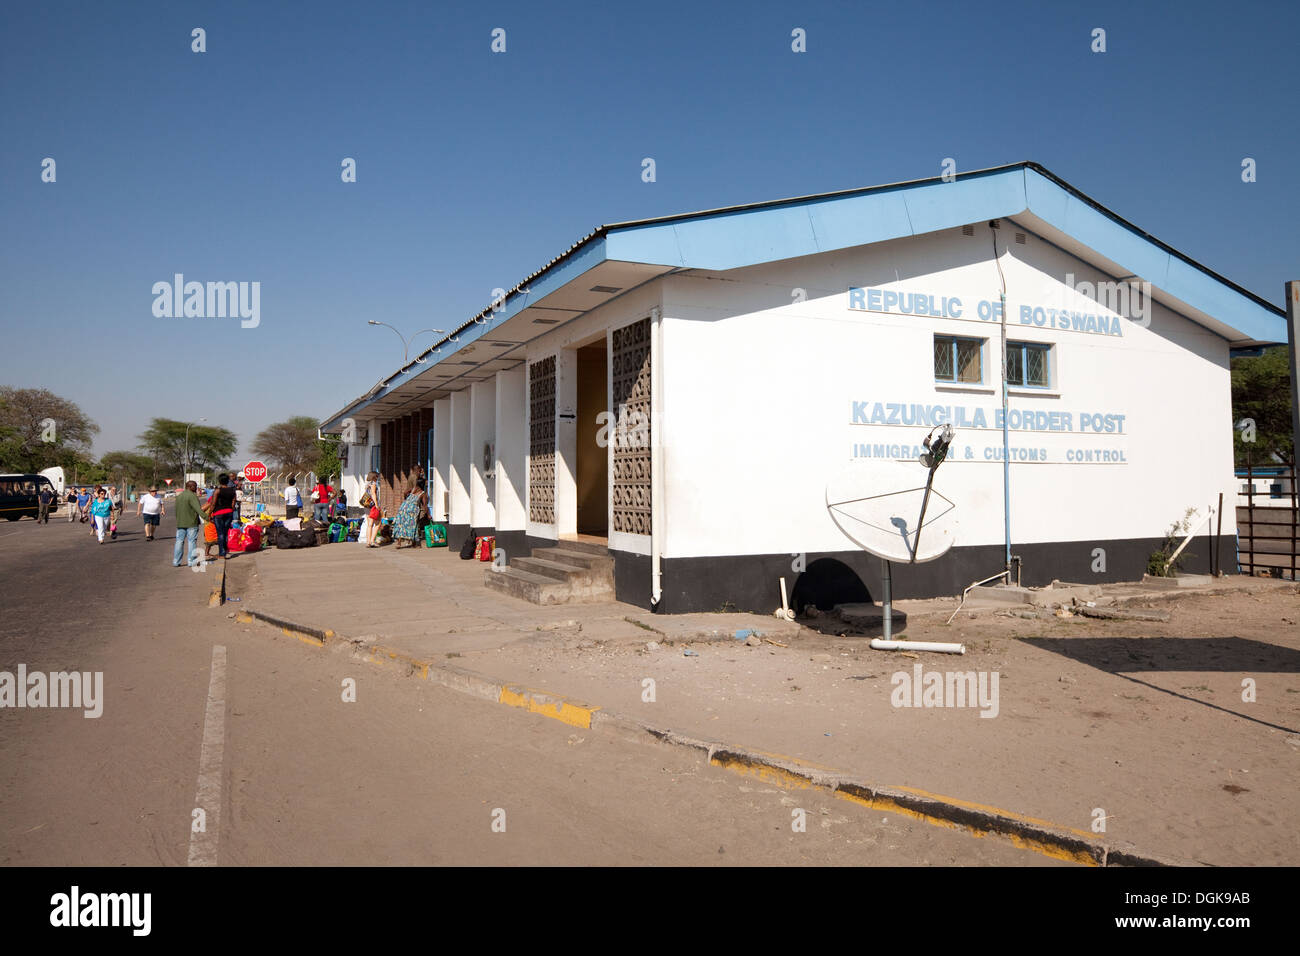 The Kazungula border post at the entrance to Botswana from Zambia, Africa - Stock Image